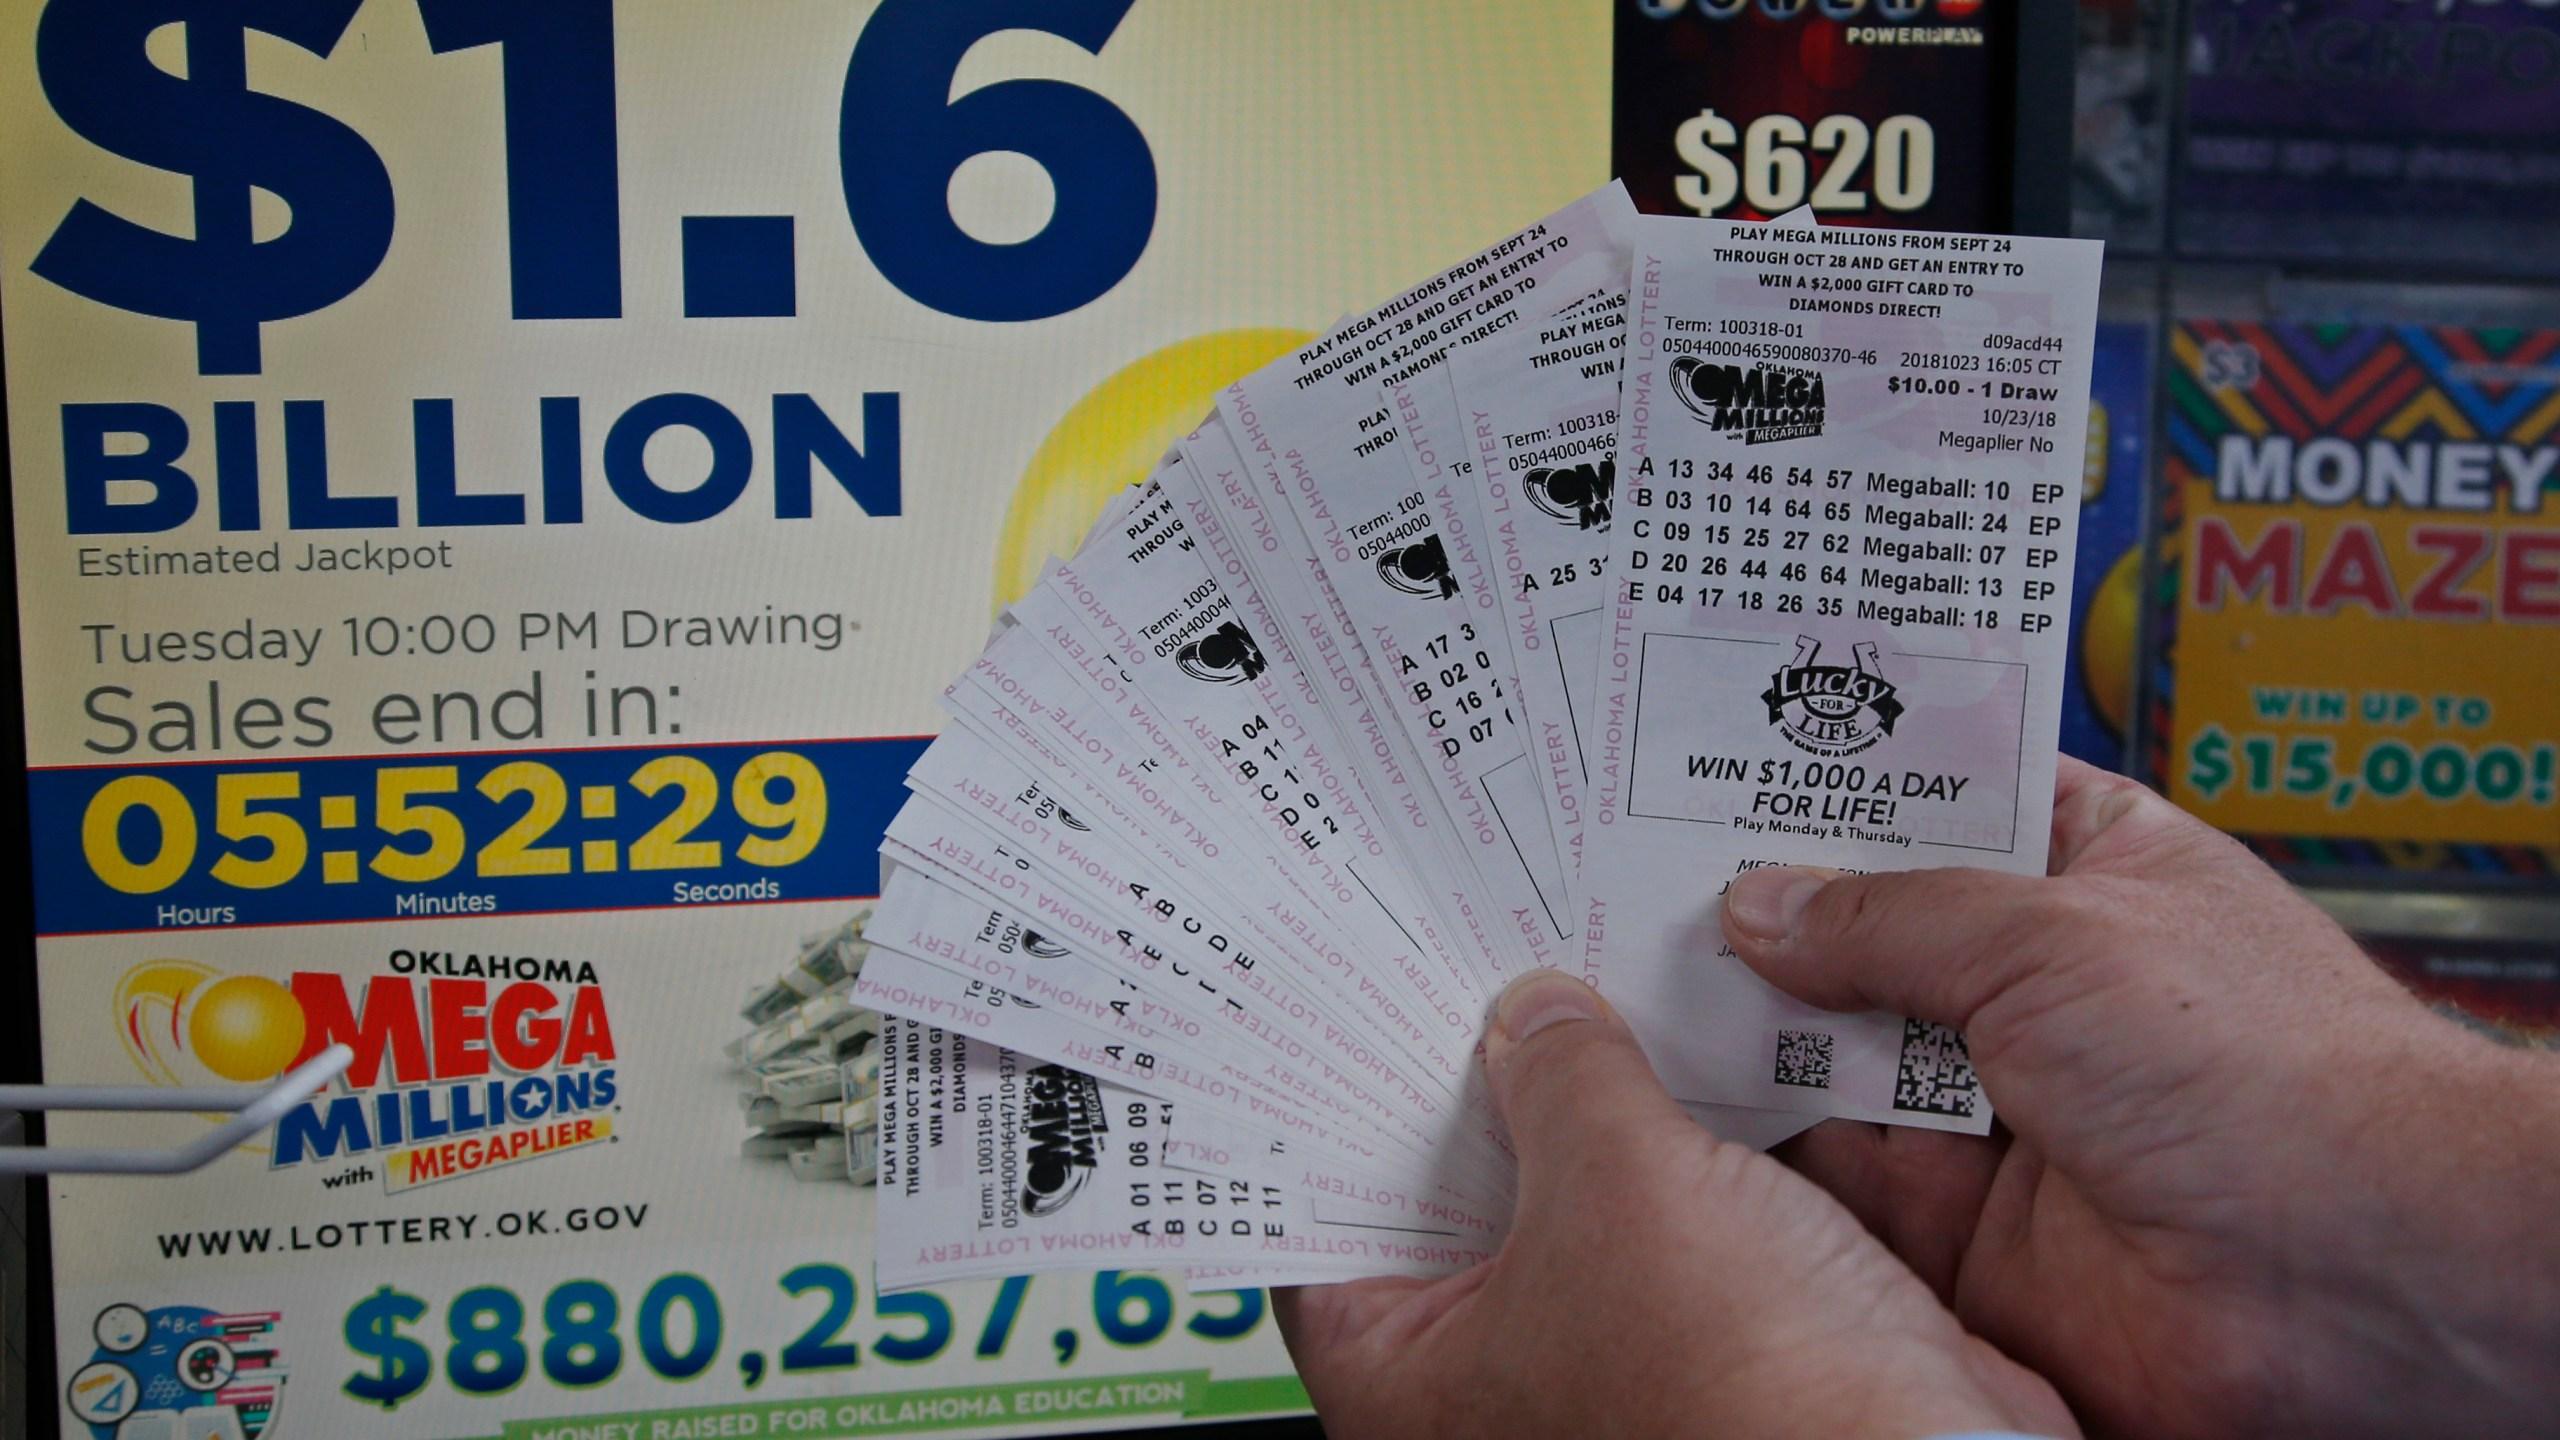 Lottery_Jackpot_82157-159532.jpg11409483